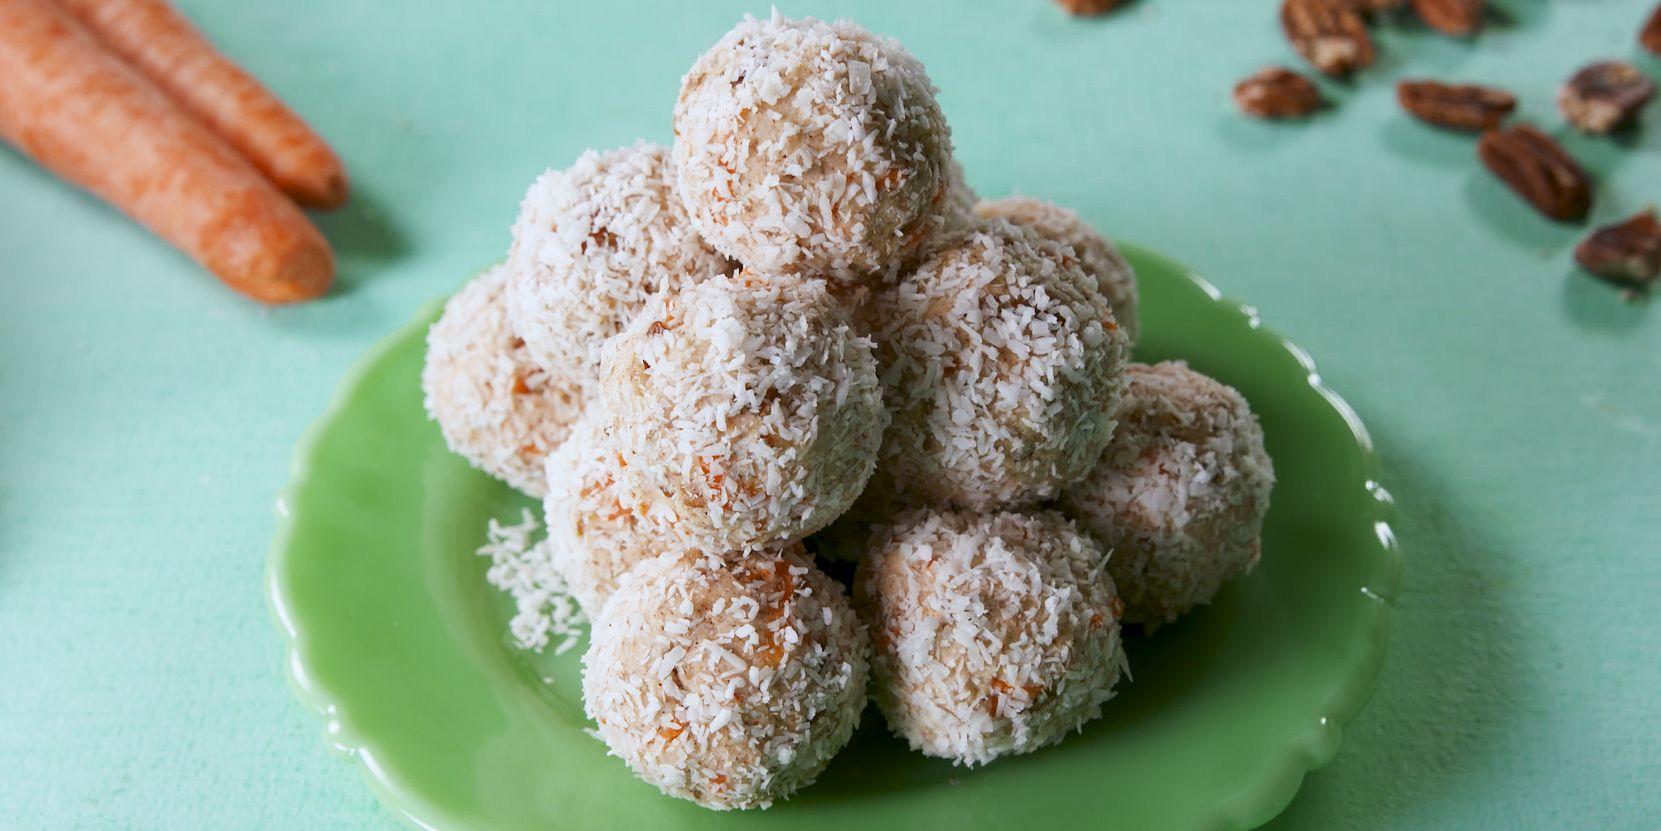 Keto Cake Recipe With Stevia: Best Carrot Cake Keto Balls Recipe